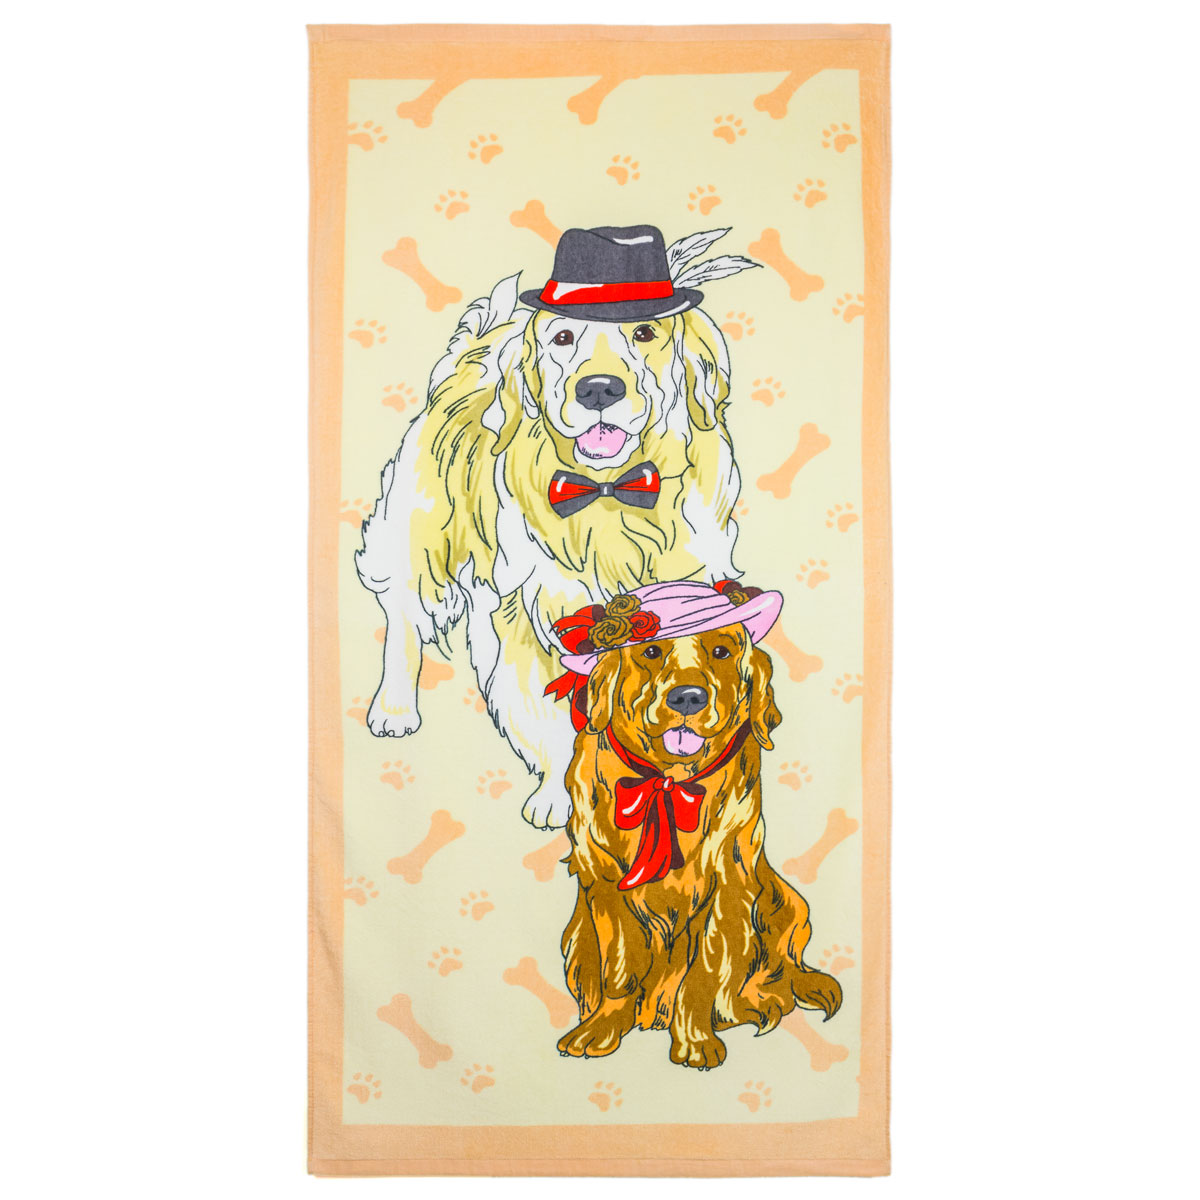 Полотенце С собаками Кремовый р. 65х135Махровые полотенца<br>Плотность ткани: 330 г/кв. м<br><br>Тип: Полотенце<br>Размер: 65х135<br>Материал: Махра